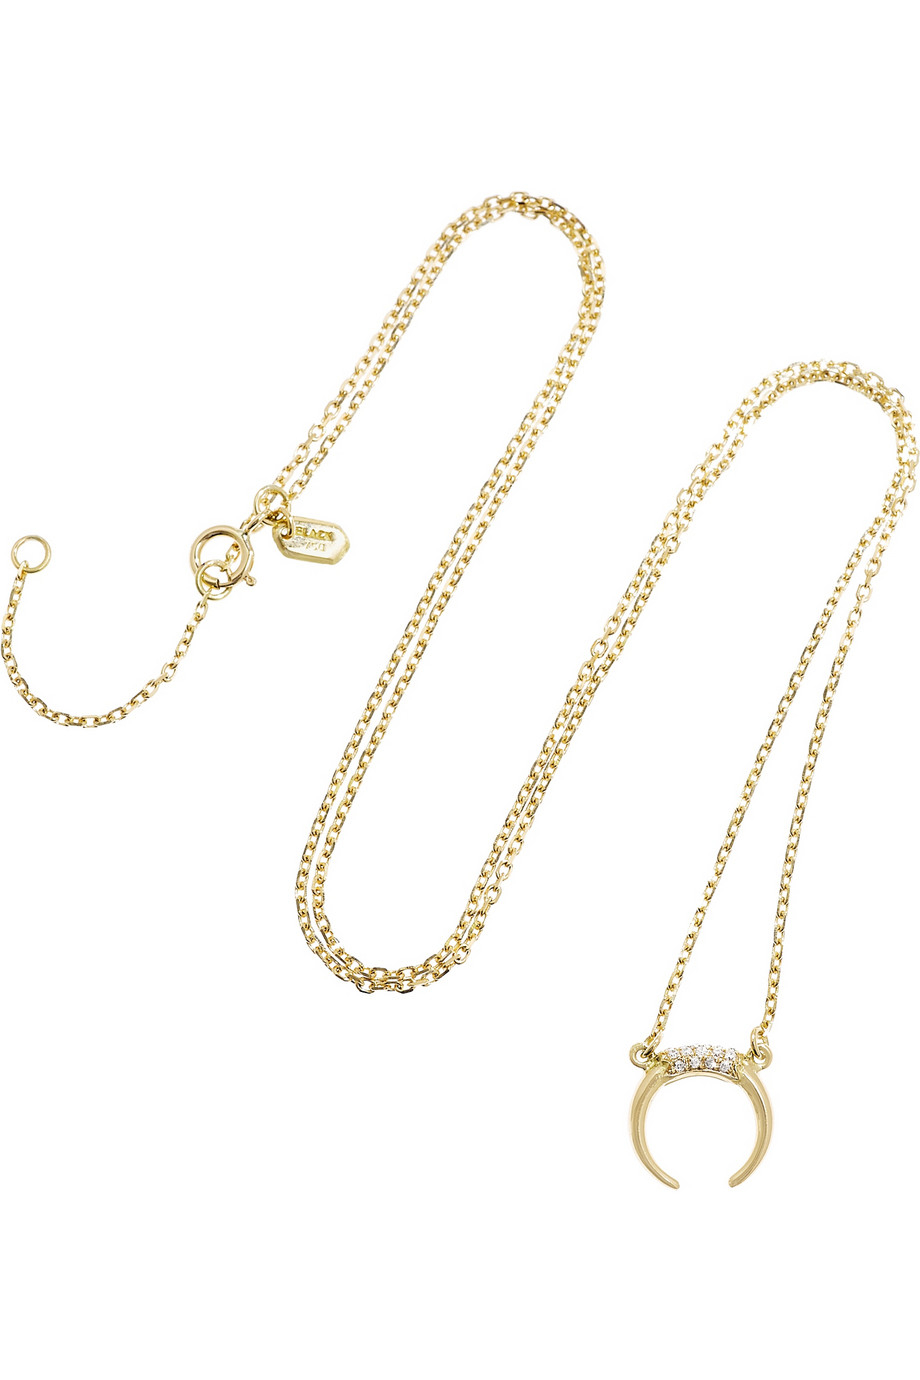 Maria Black 14 Karat Long Check Necklace in Metallics 4hzosLa